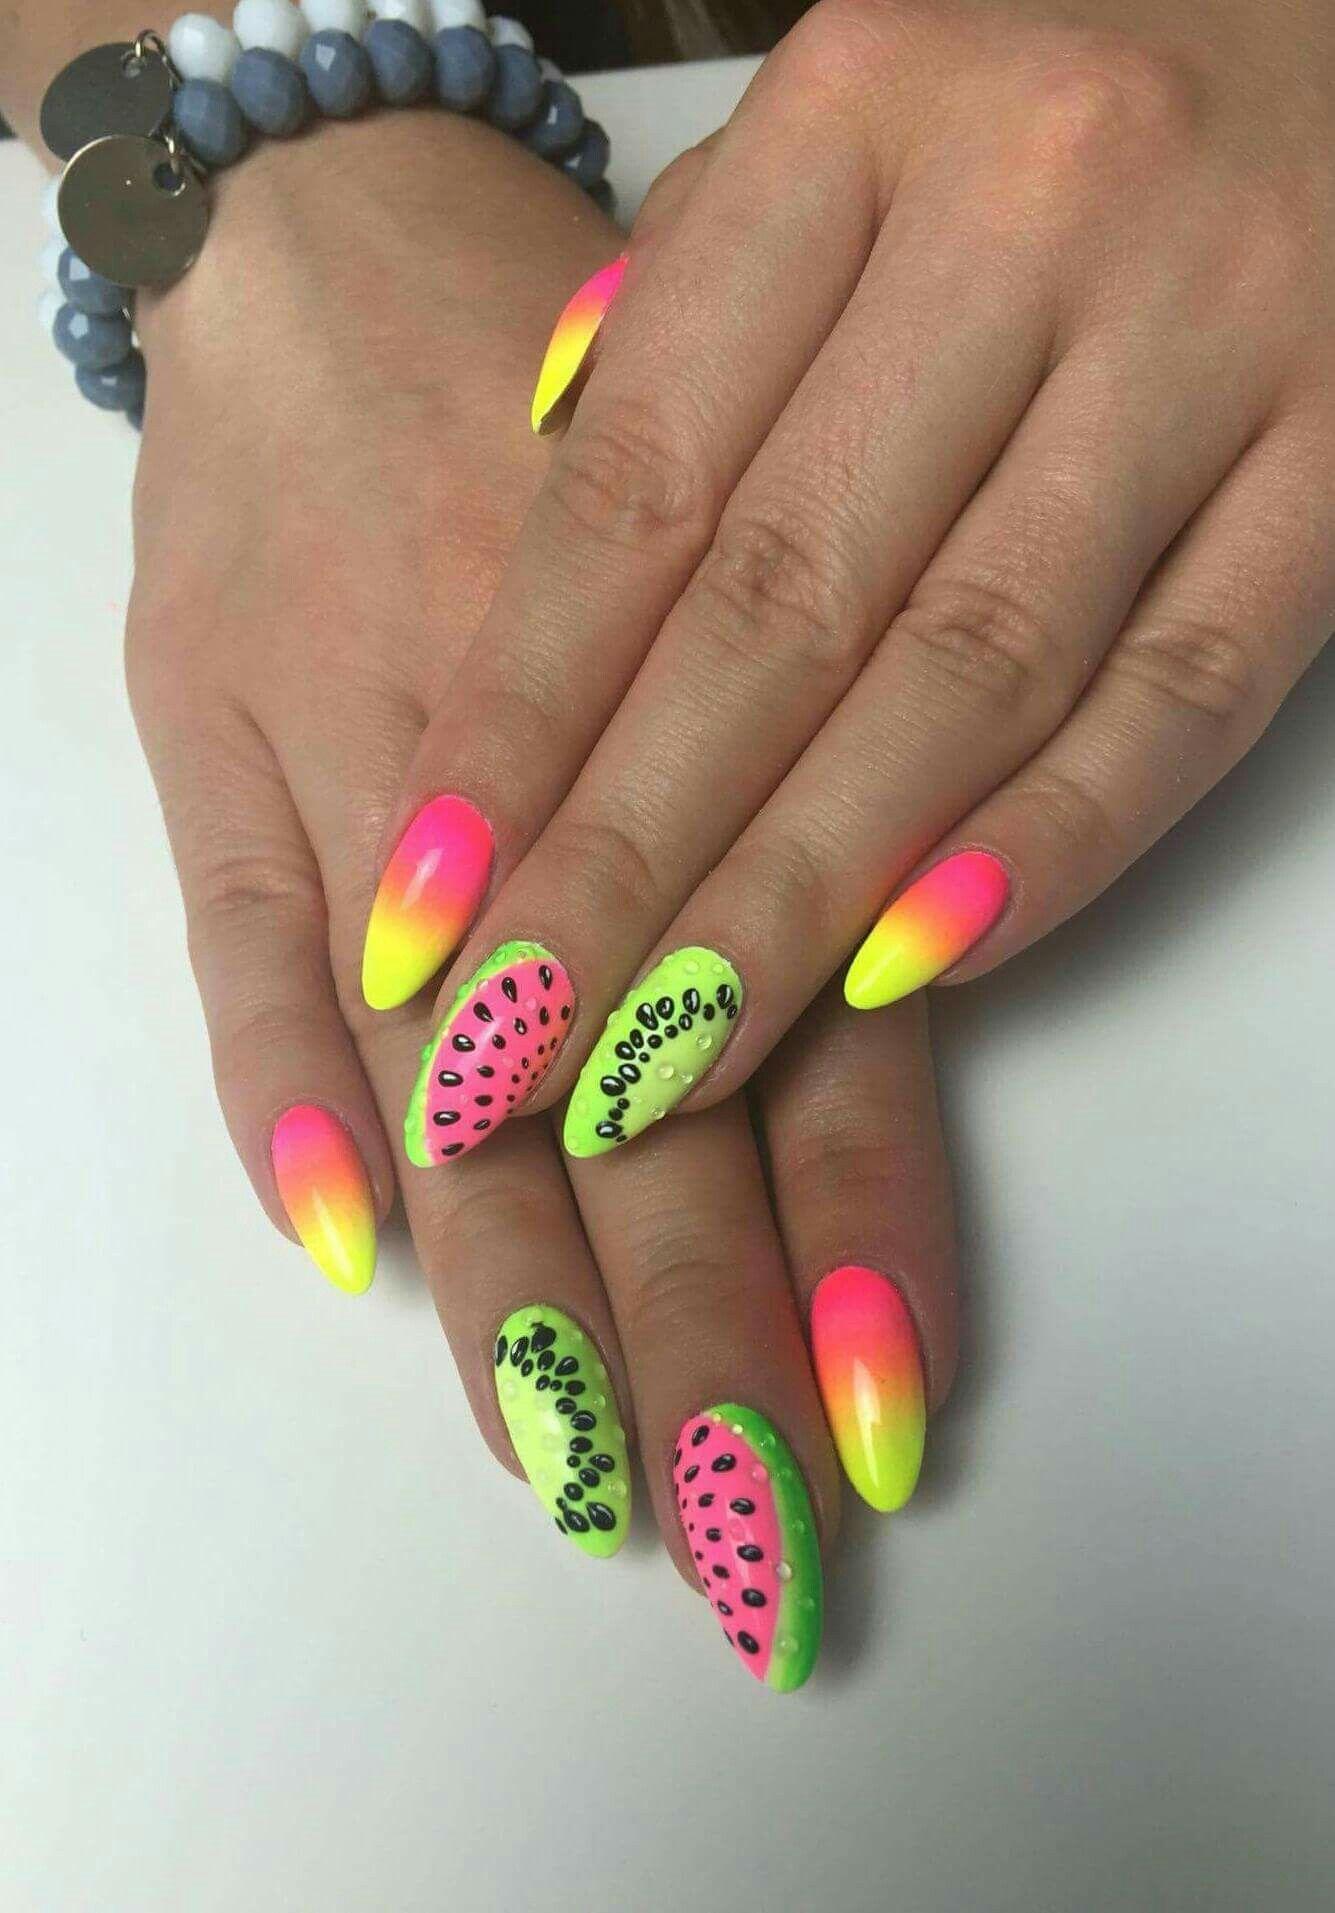 Pin By Naninails On Summer Nail Art Gelove Nehty Nail Art Nehty